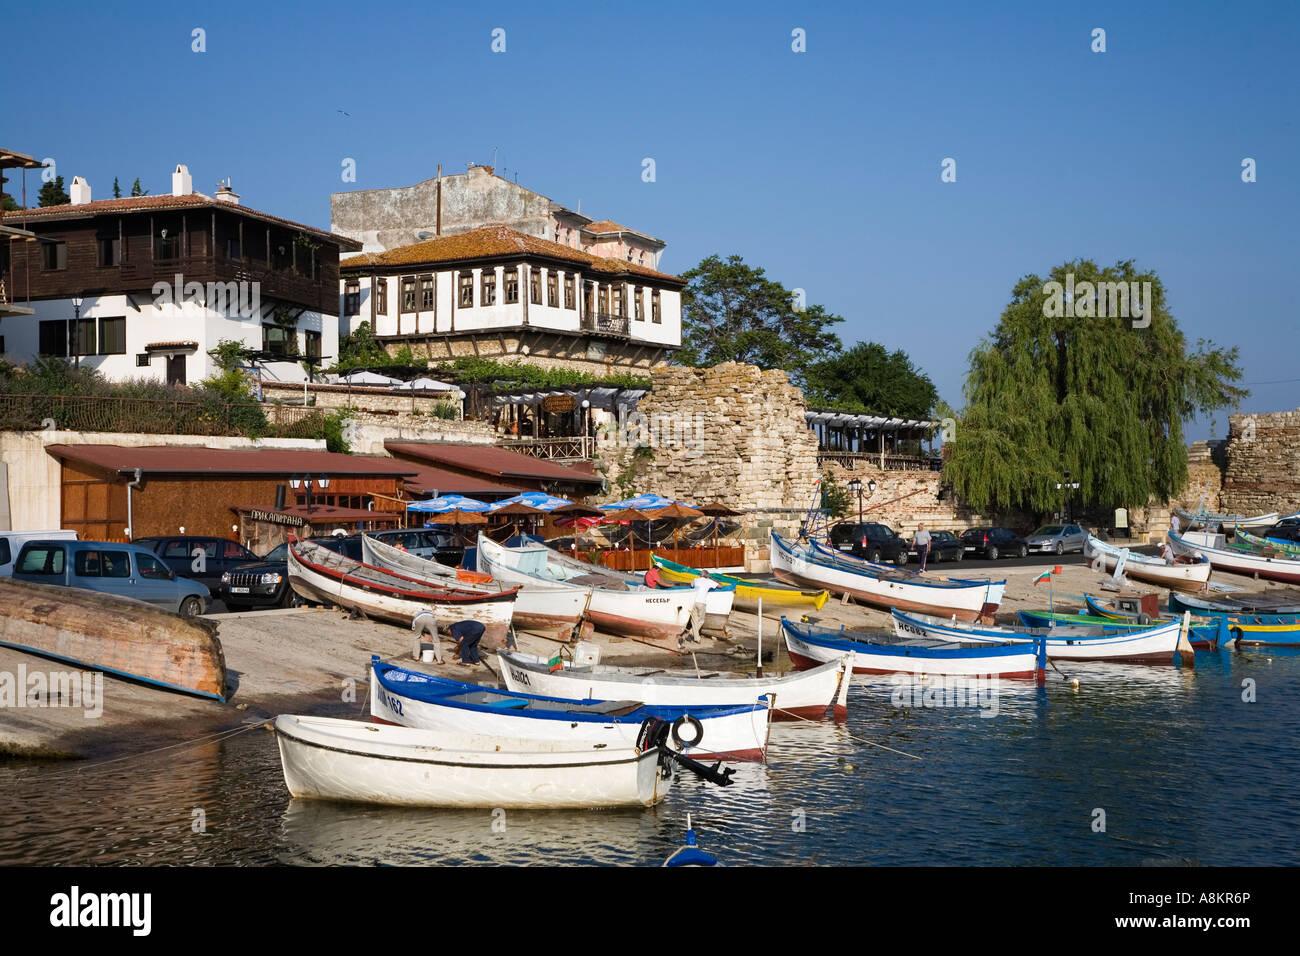 Southern harbour, Town museum Nesebar, Black Sea, Bulgaria - Stock Image